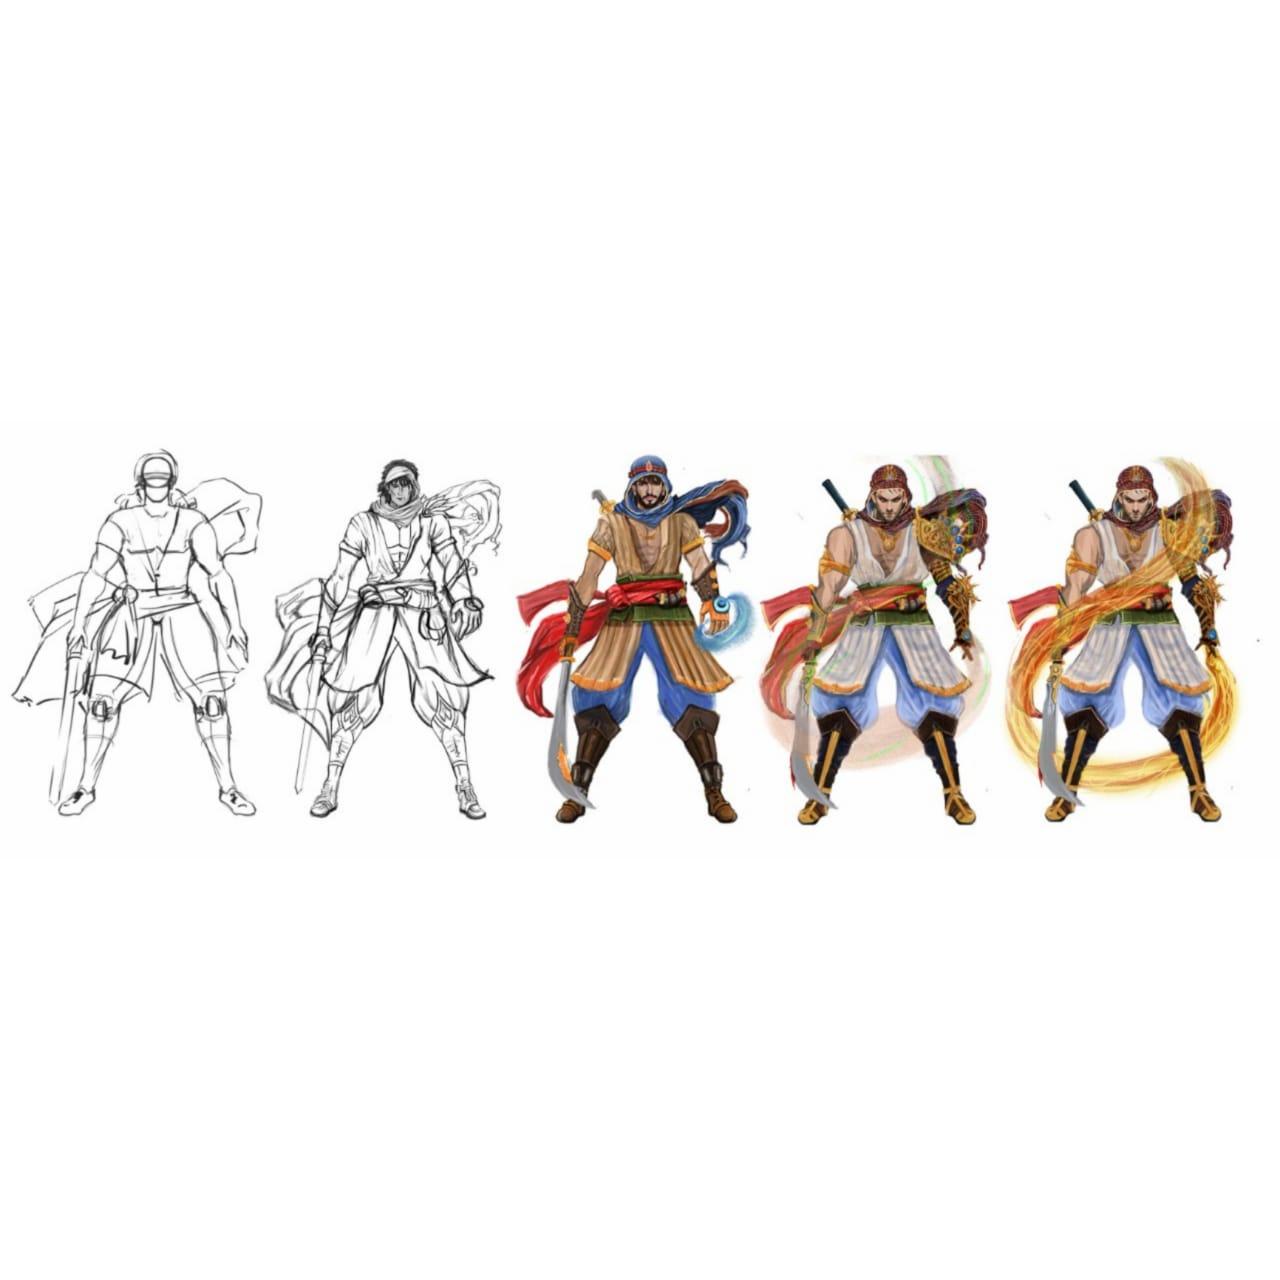 GameYan Studio - Character Concept Art Services by 3D Game Art Studio, Denton - Texas